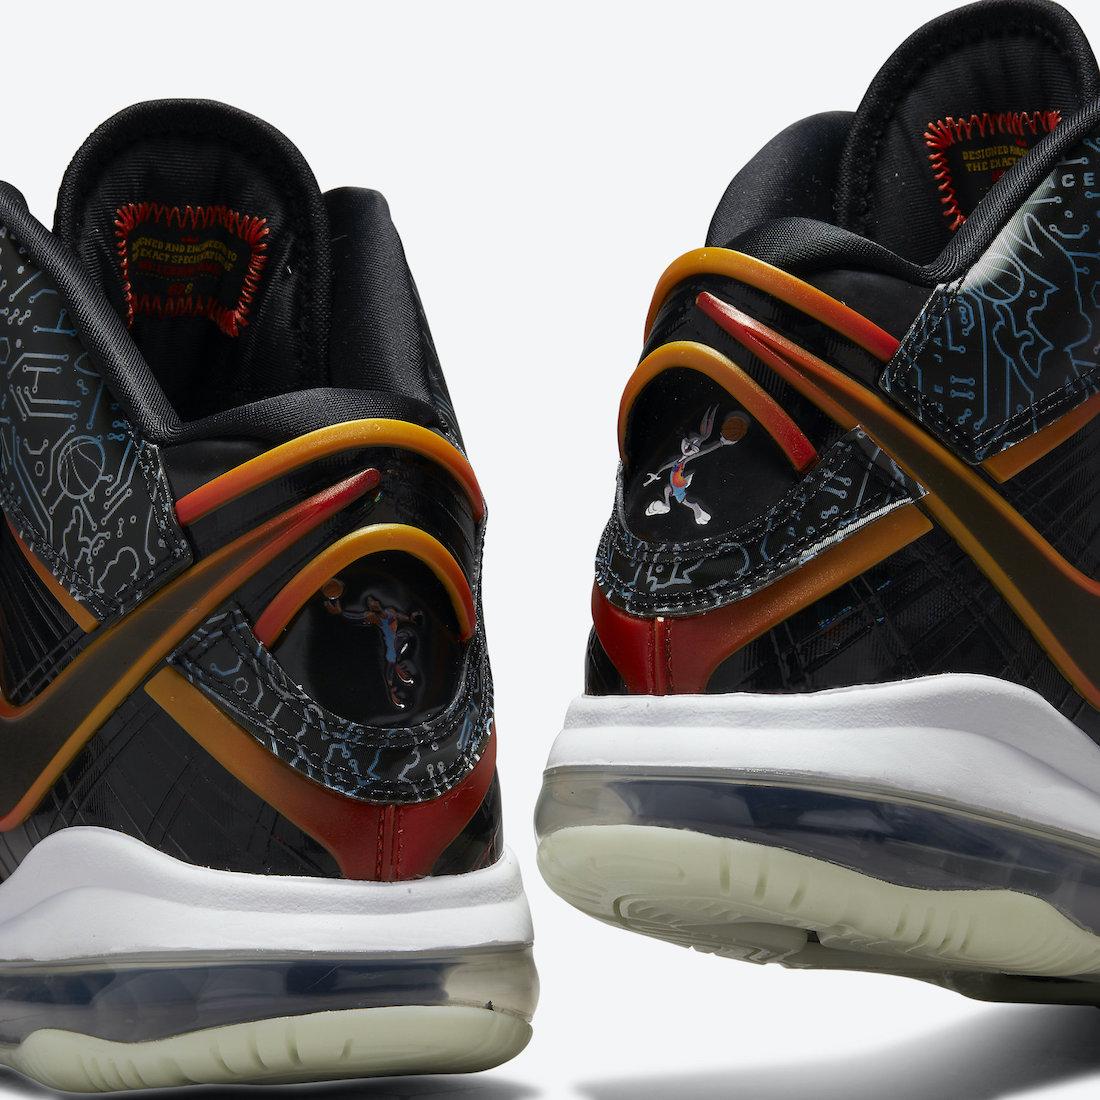 Nike-LeBron-8-Space-Jam-DB1732-001-Release-Date-11